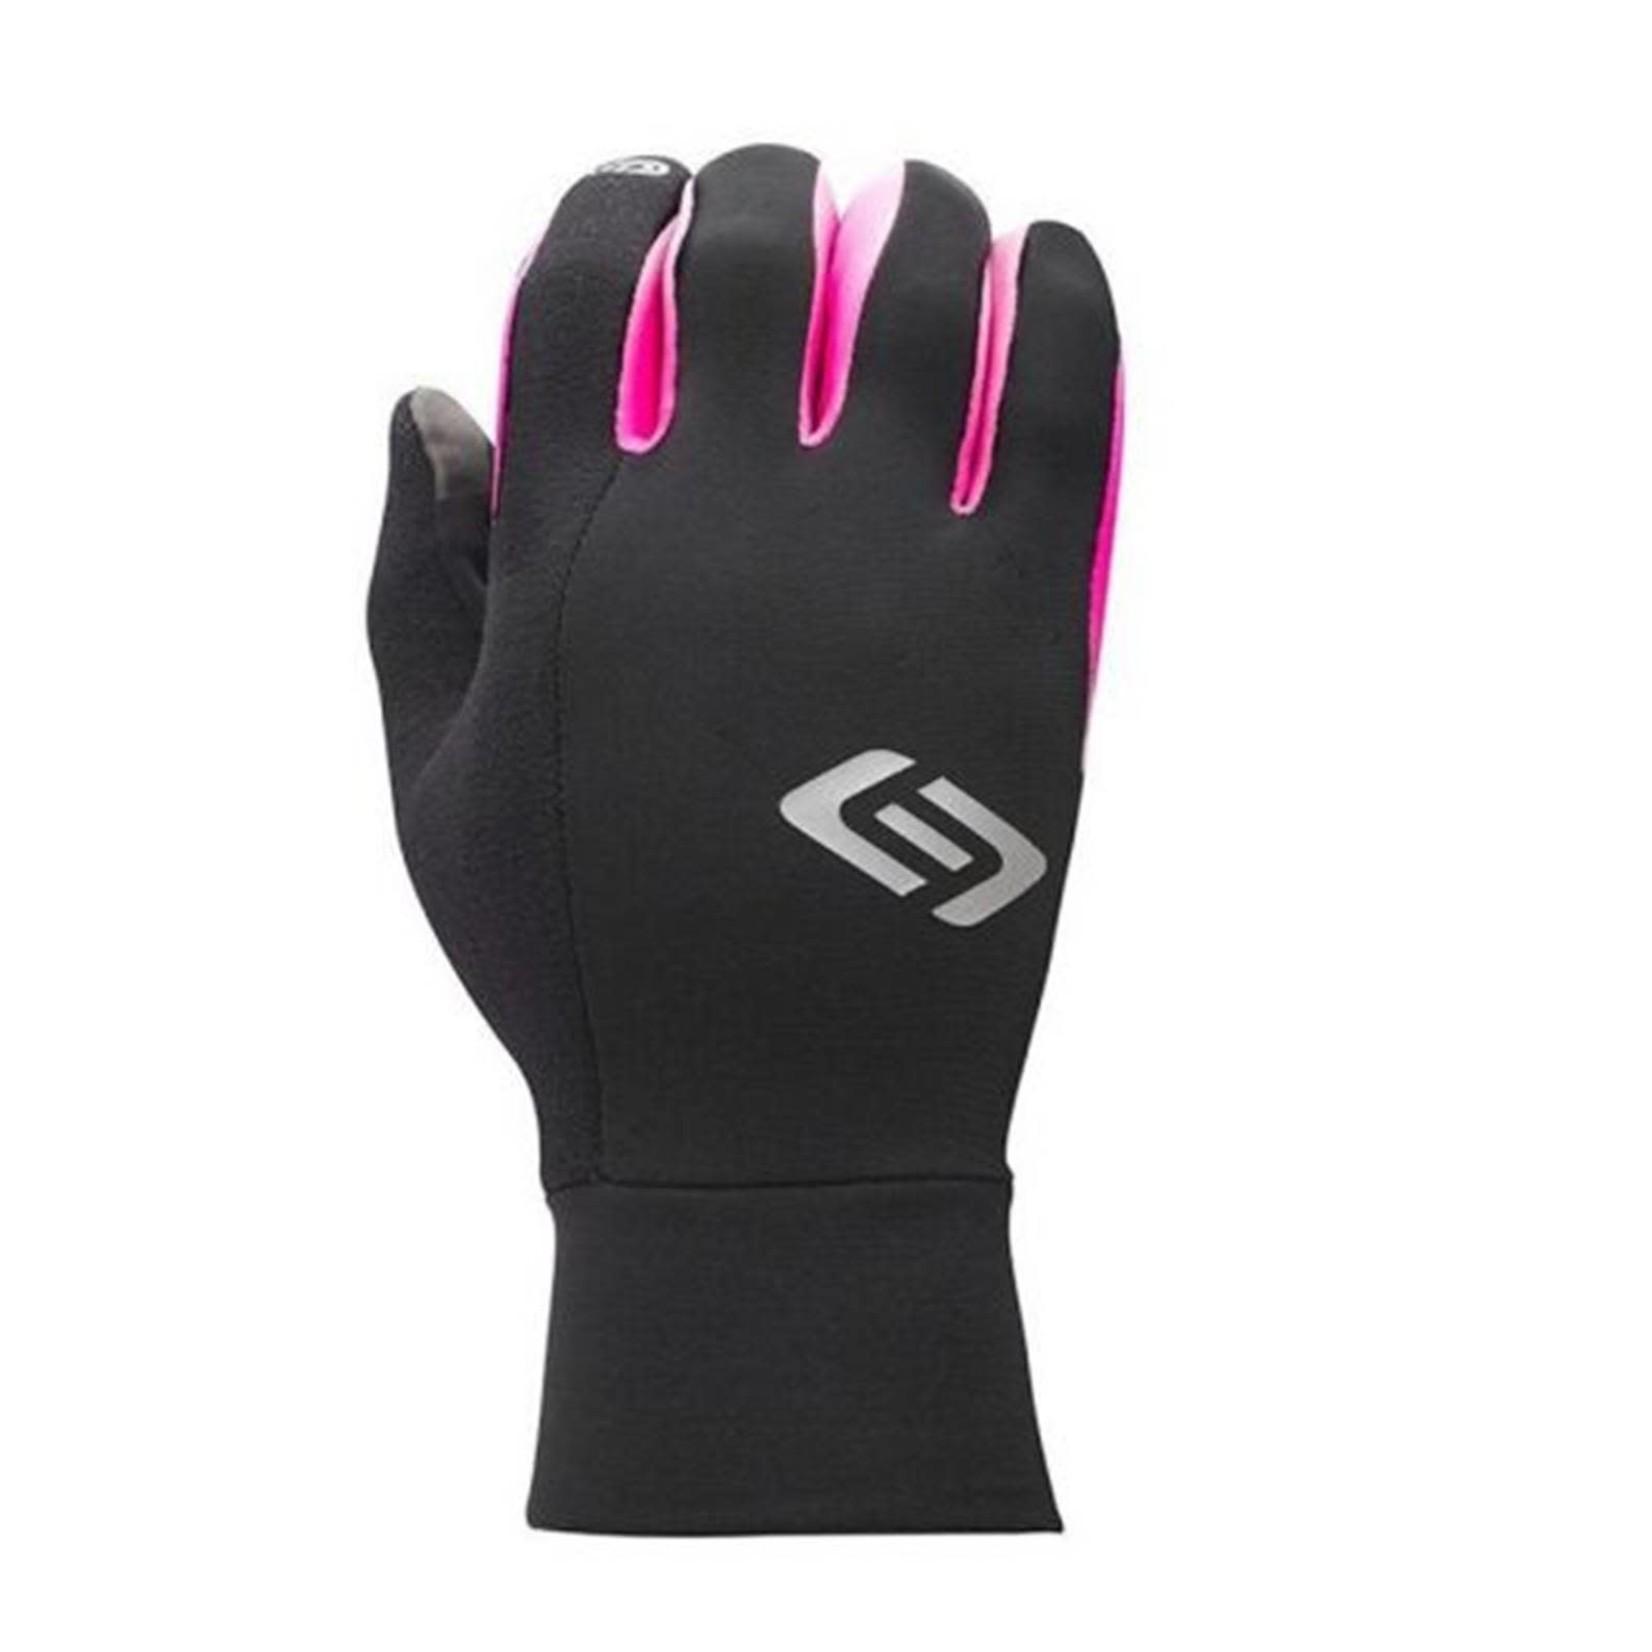 BELLWETHER Bellwether Climate Control Black/Pink Gloves